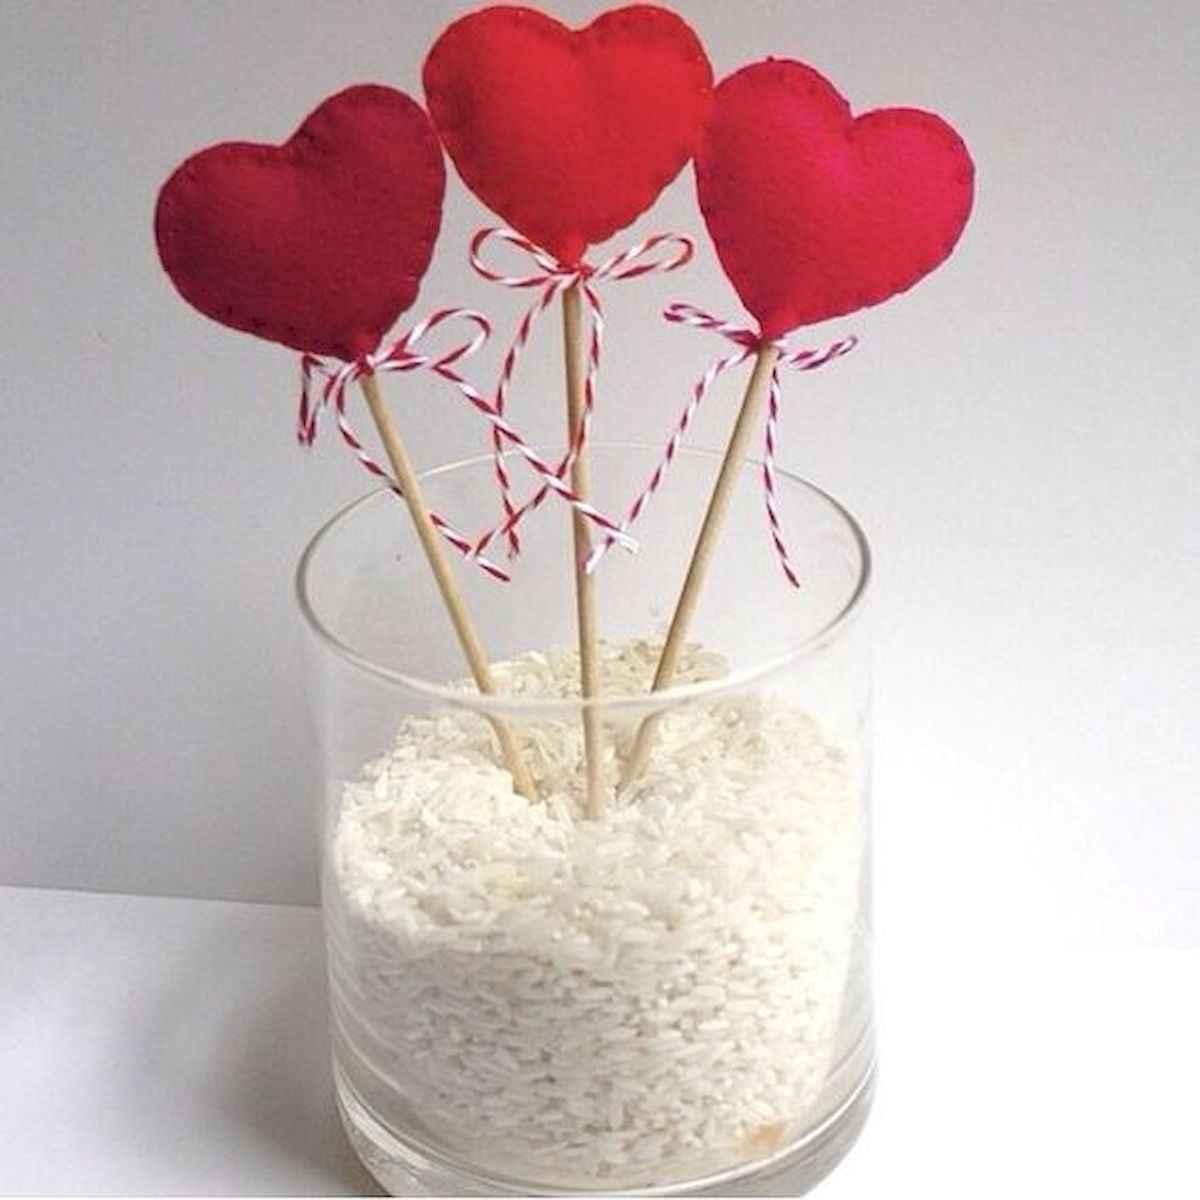 50 Romantic Valentines Day Decor Ideas (45)